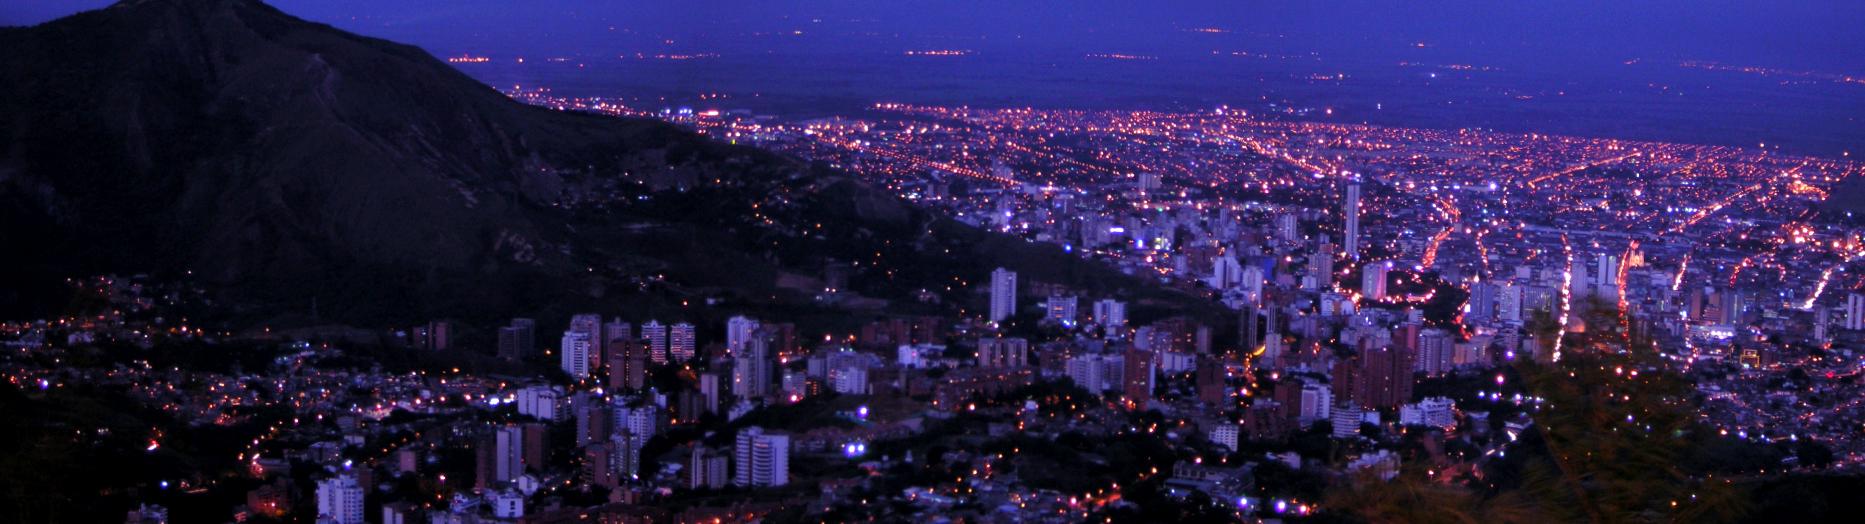 Descripción Gatonegro Cali Noche desde Cristo Rey.jpg